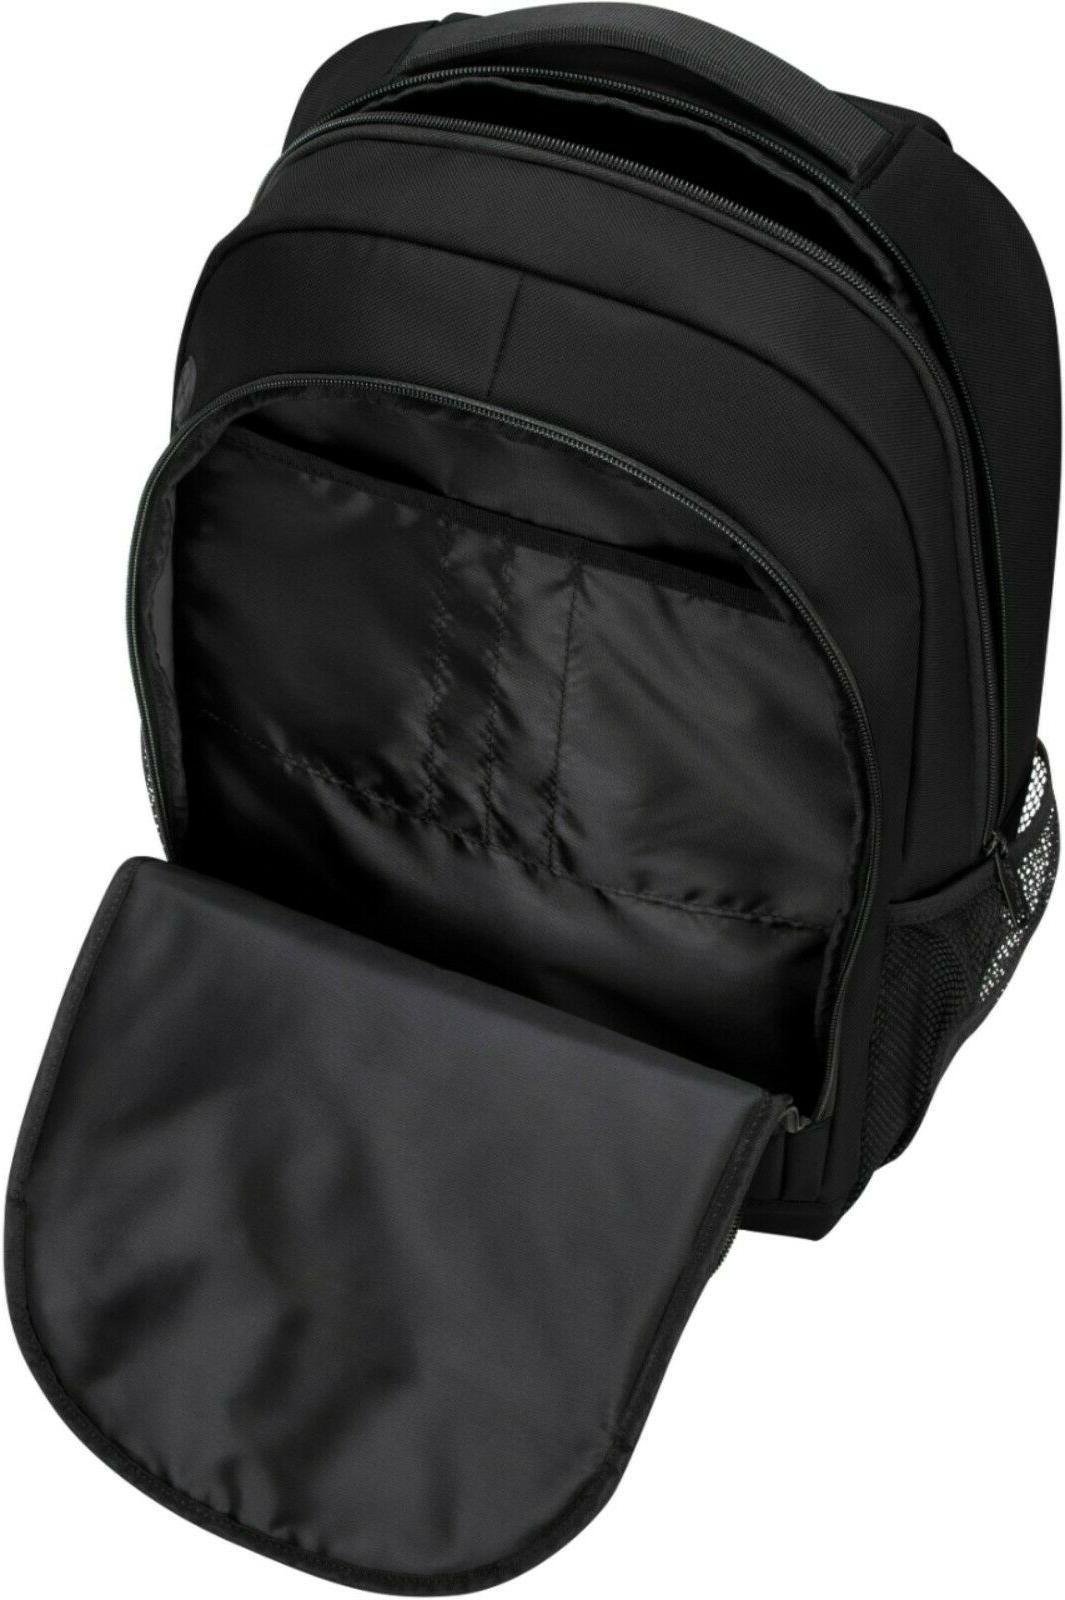 Laptop Pack - Black